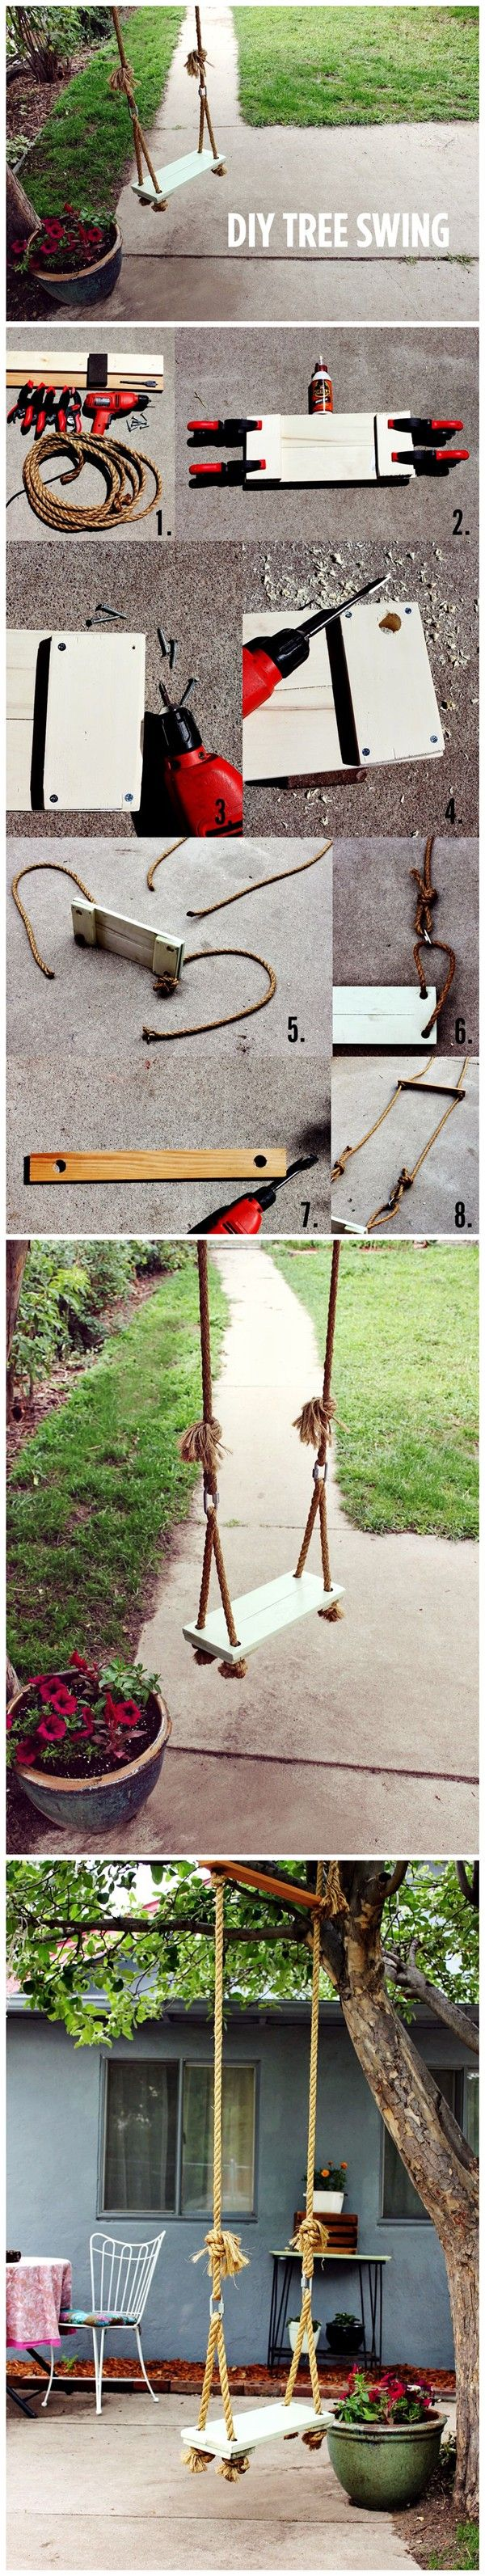 How to build a tree swing -  Diy Tree Swing Tutorial